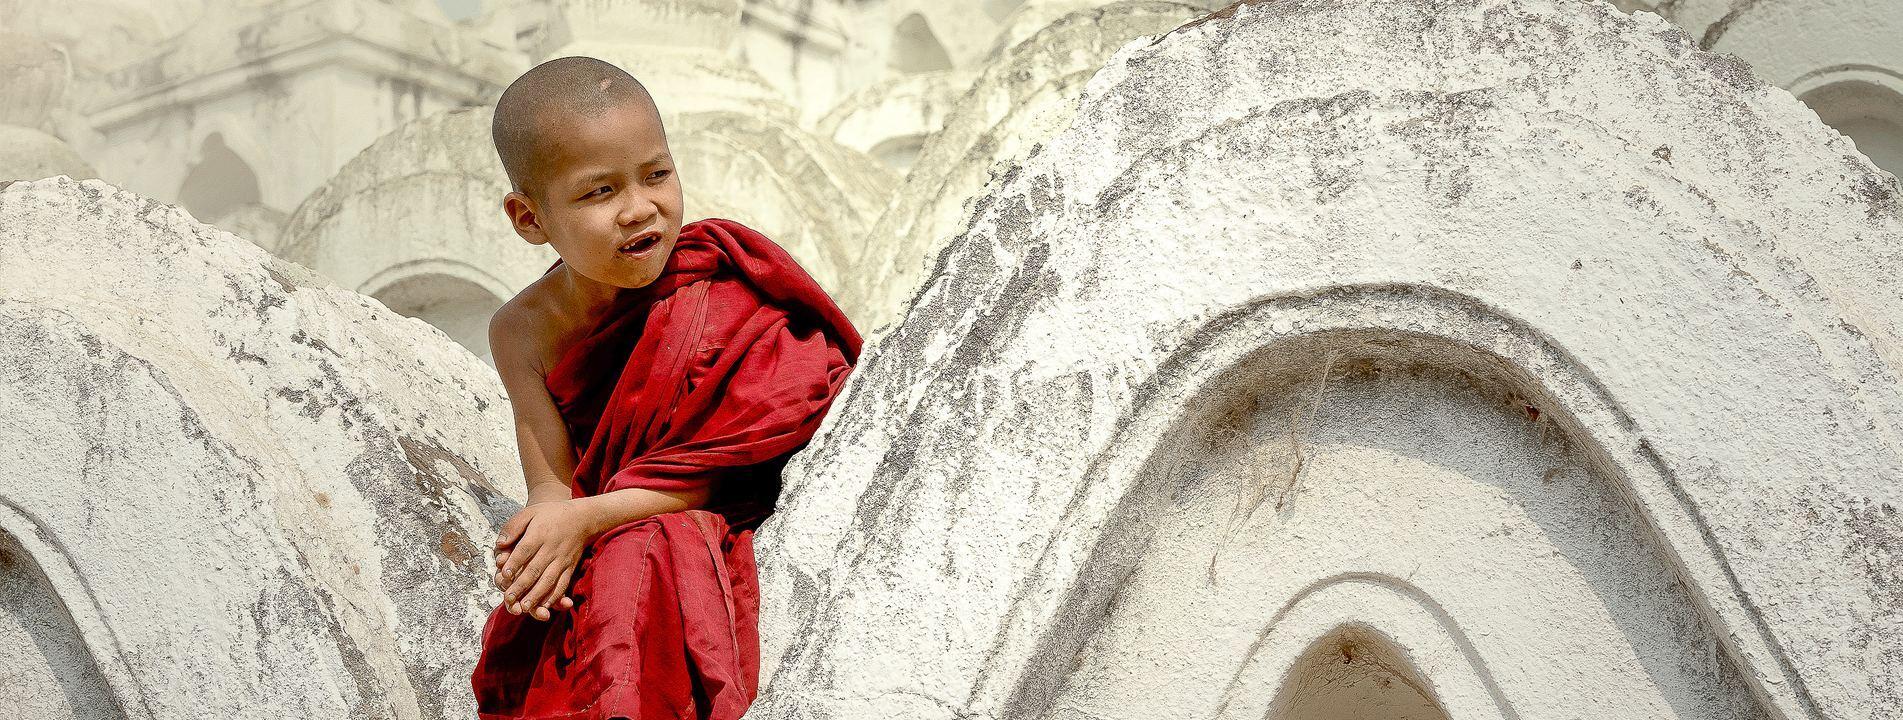 28-Day Grand Indochina Tour